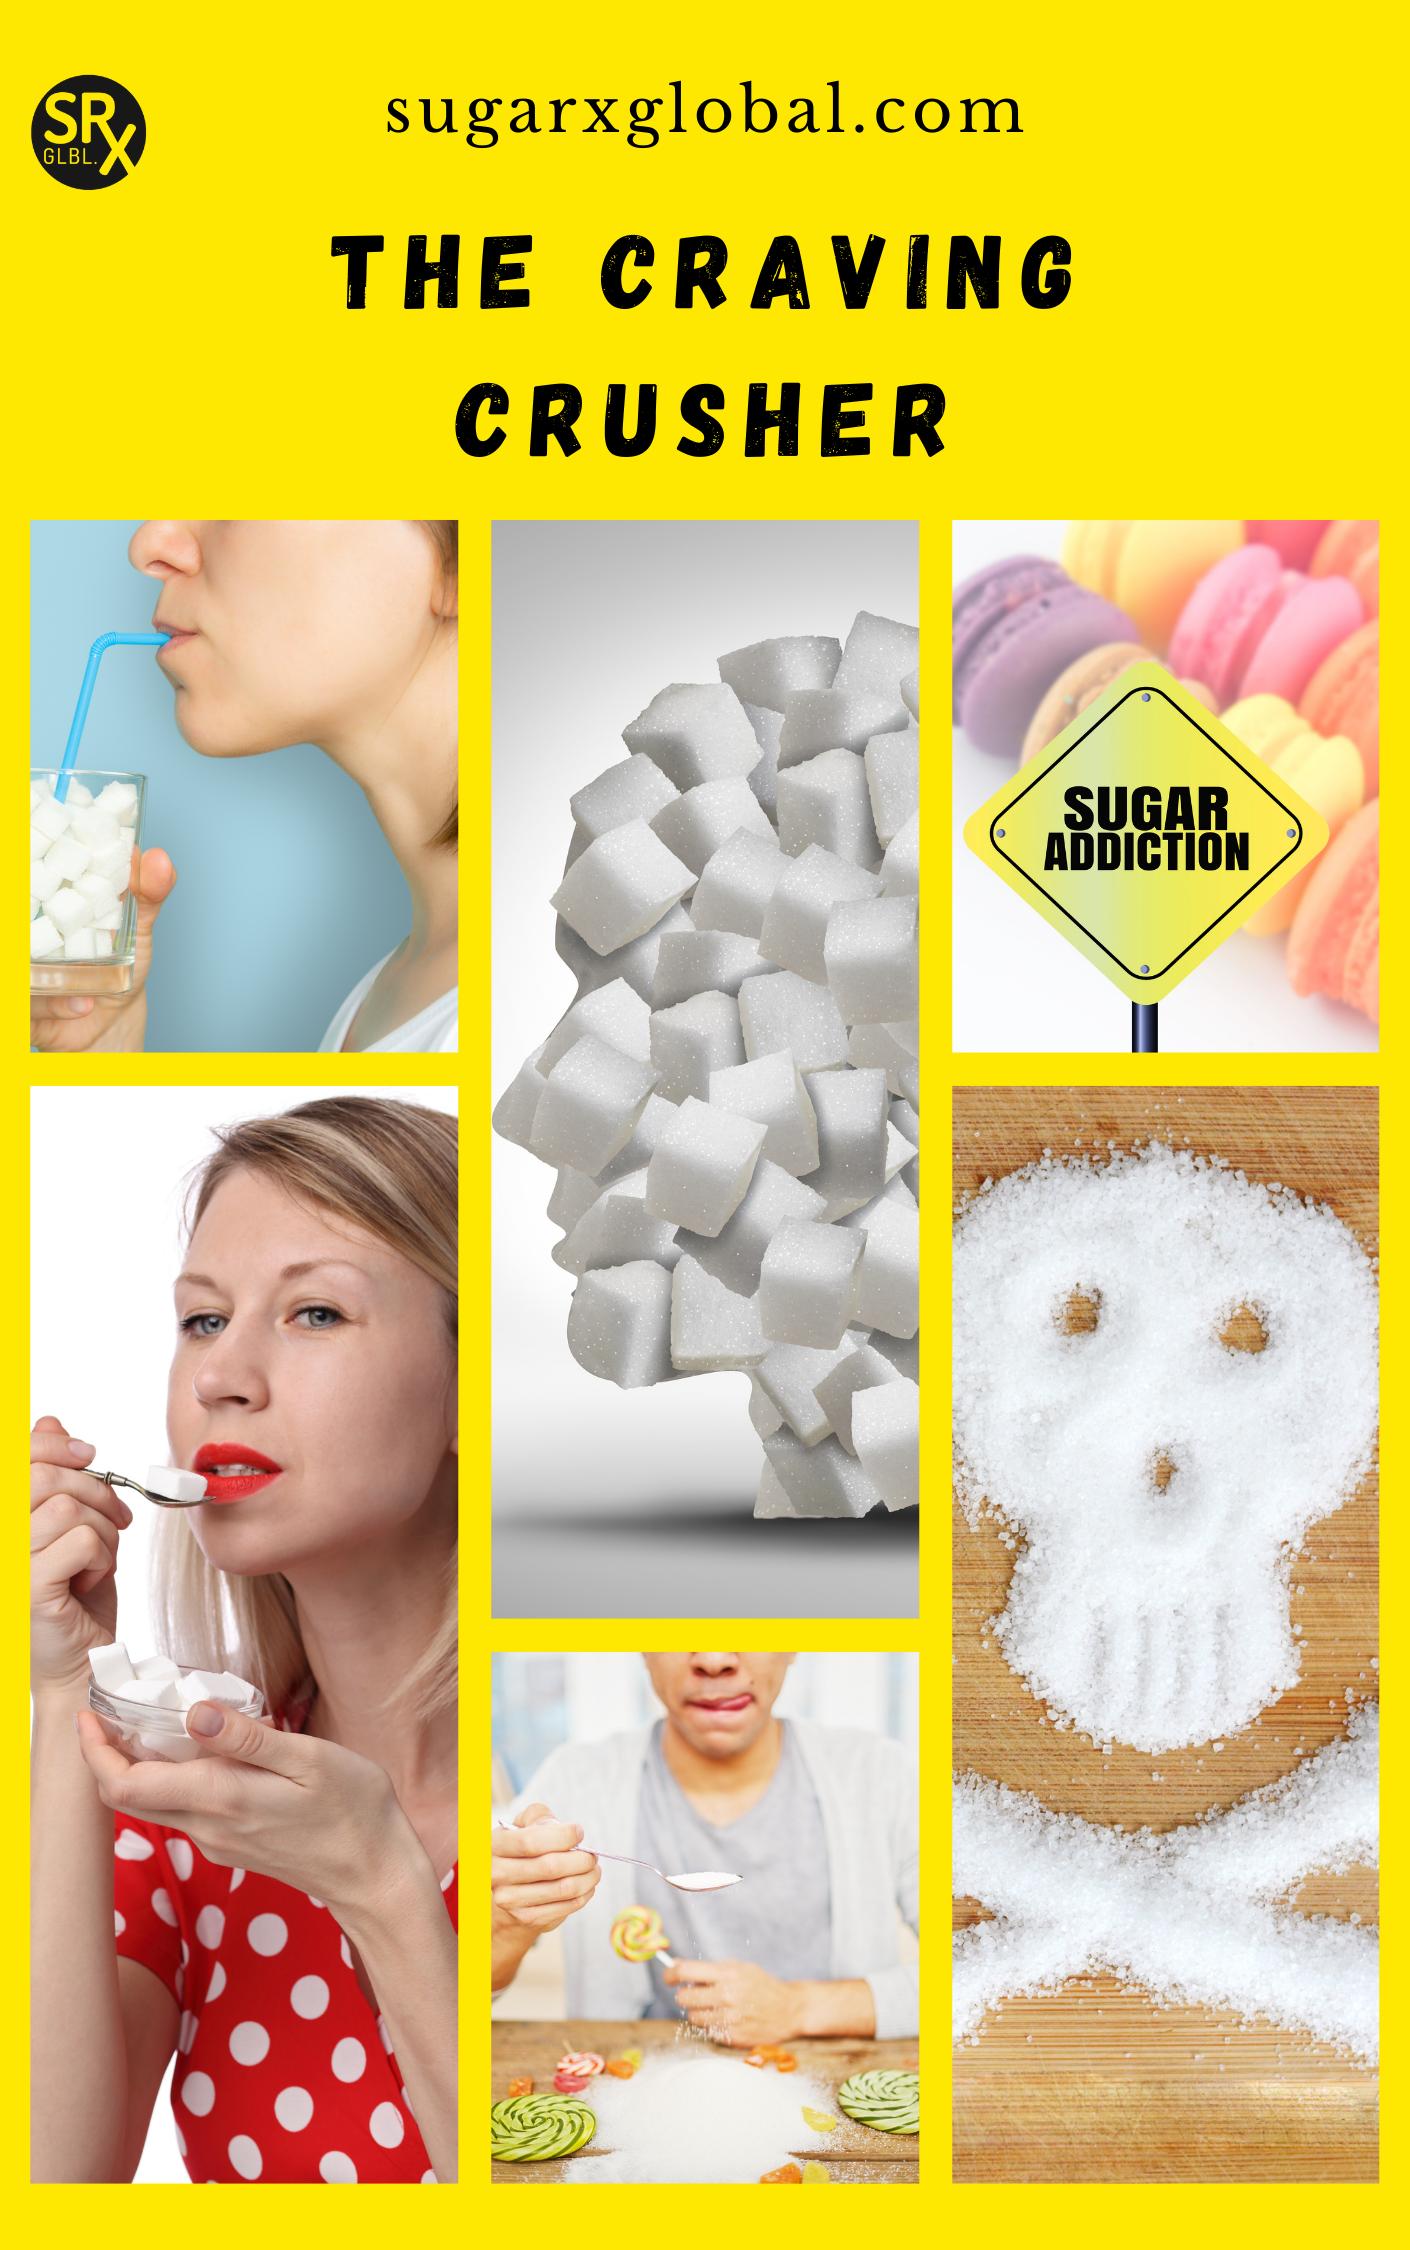 Tha Craving Crusher 2.0.png